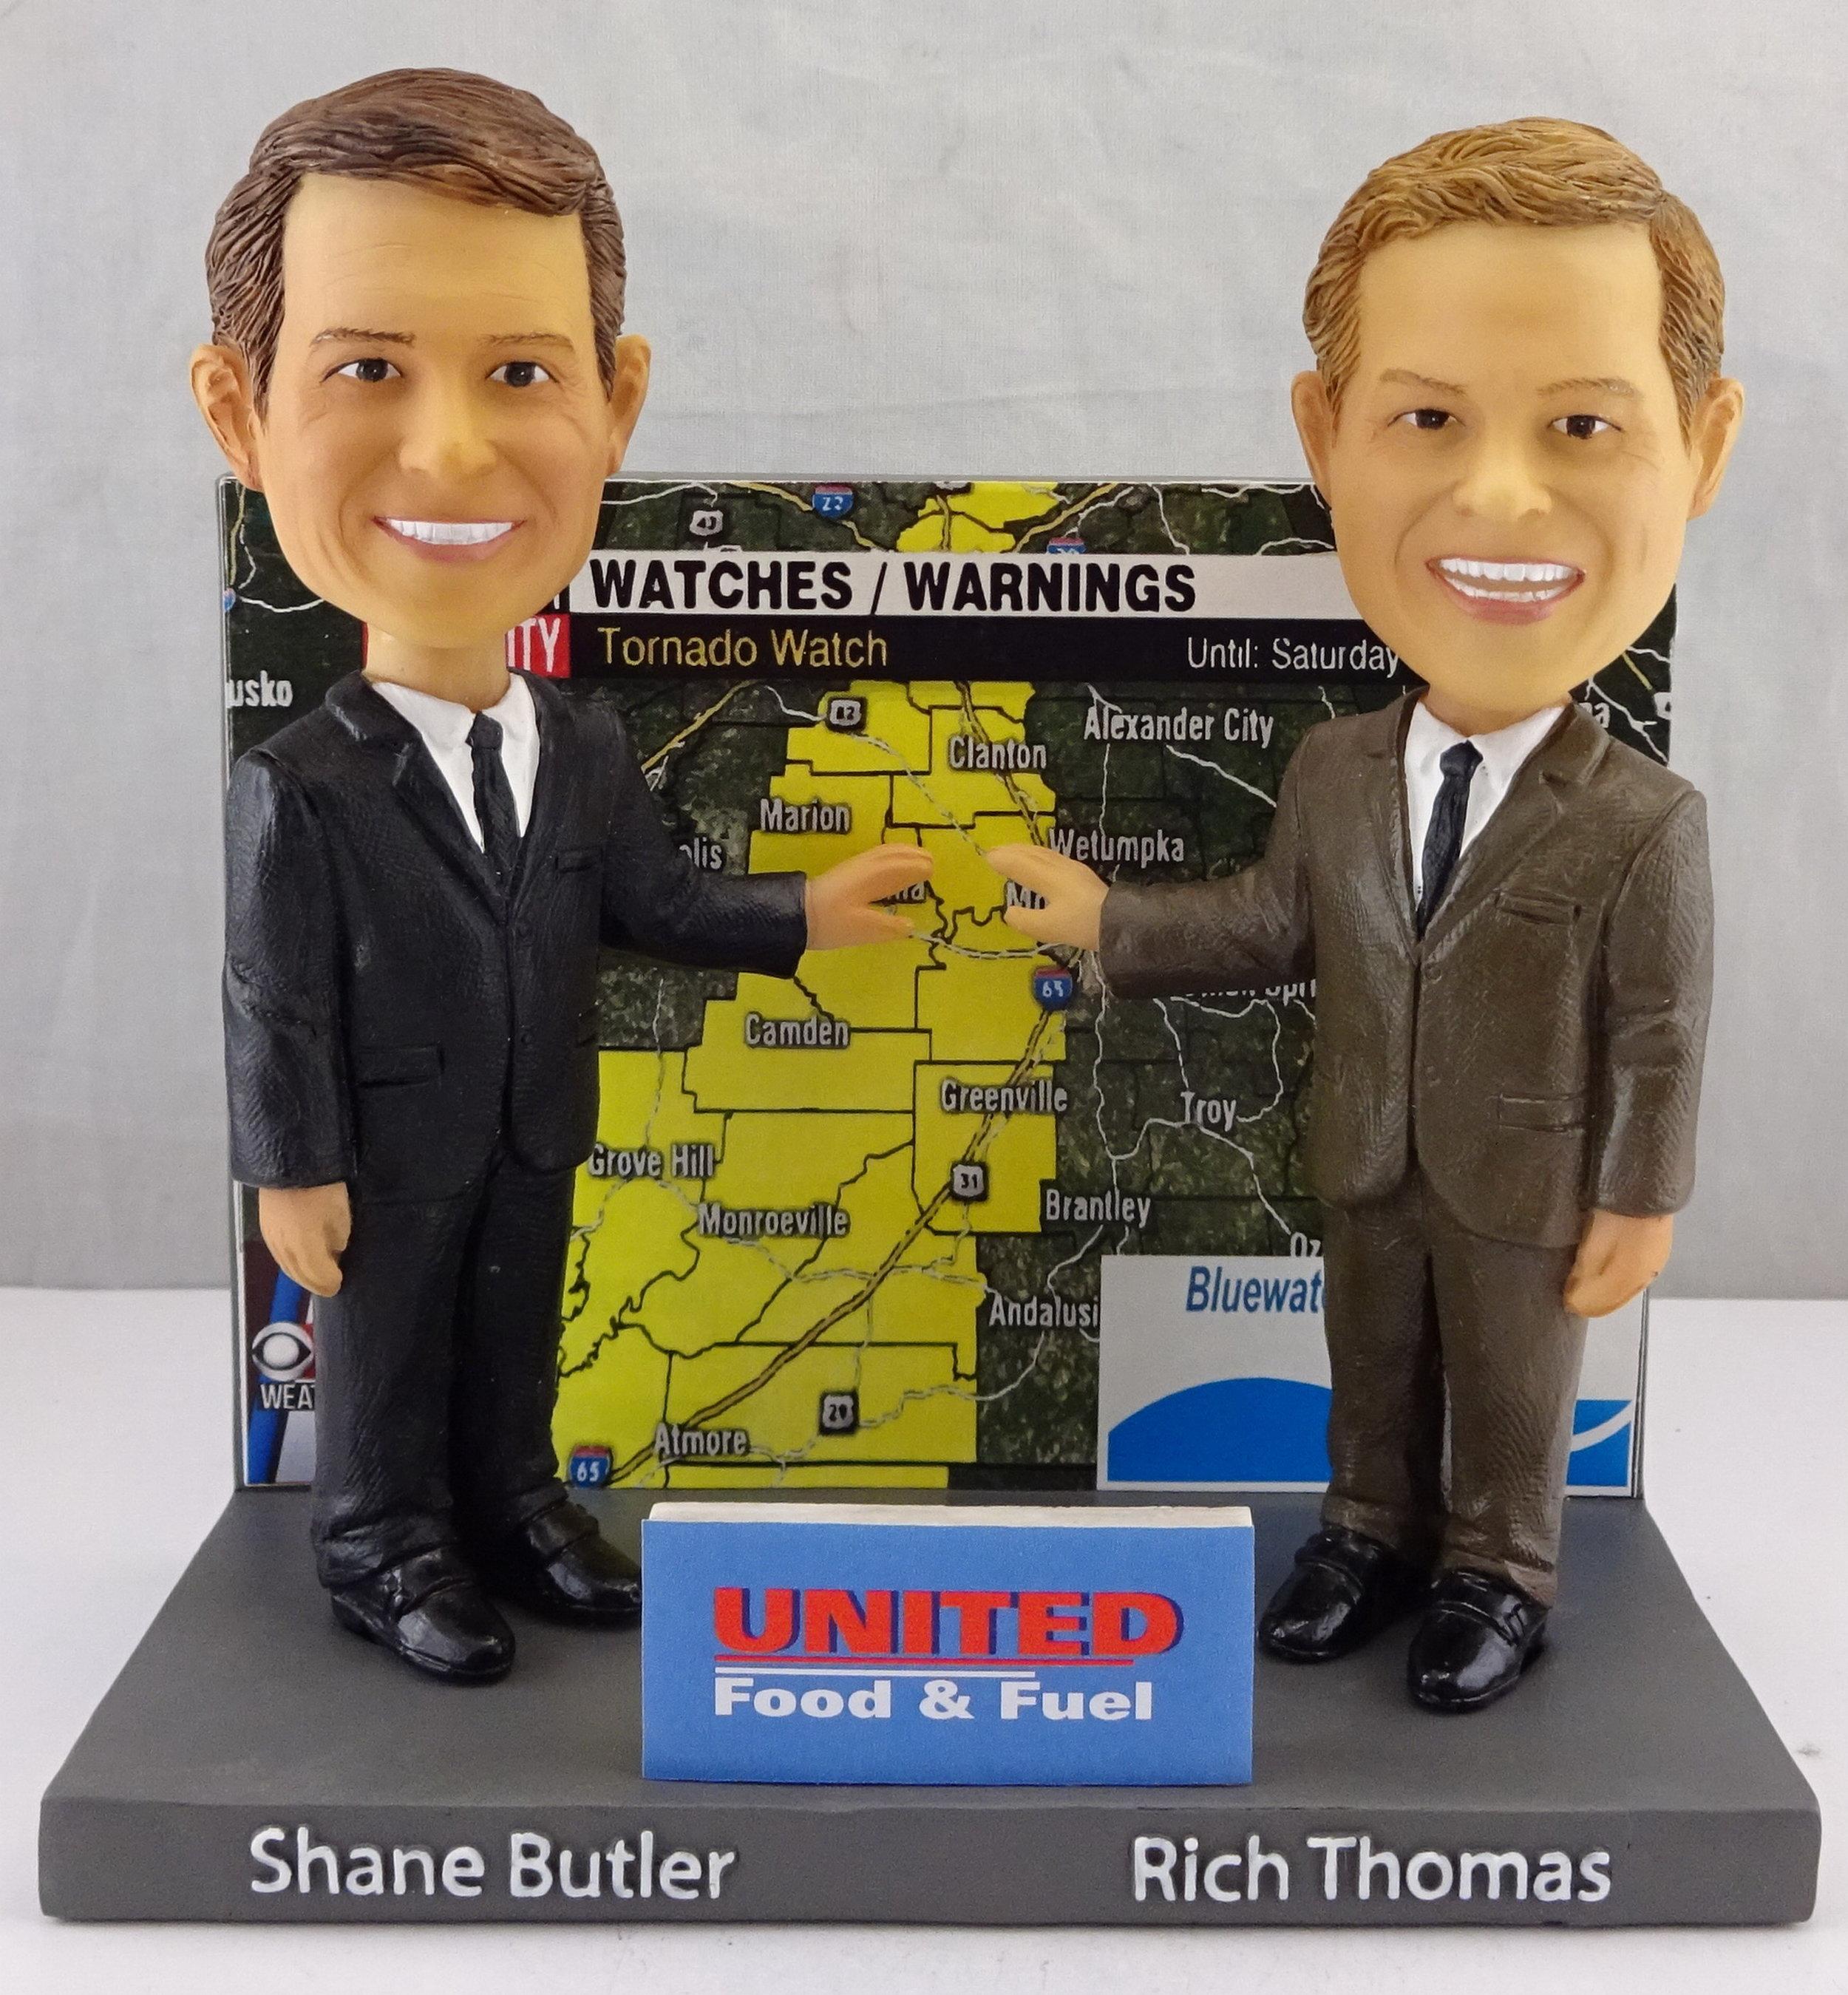 WAKA - Rich Thomas and Shane Butler 113702, 5in Dual Bobbleheads (1).jpg